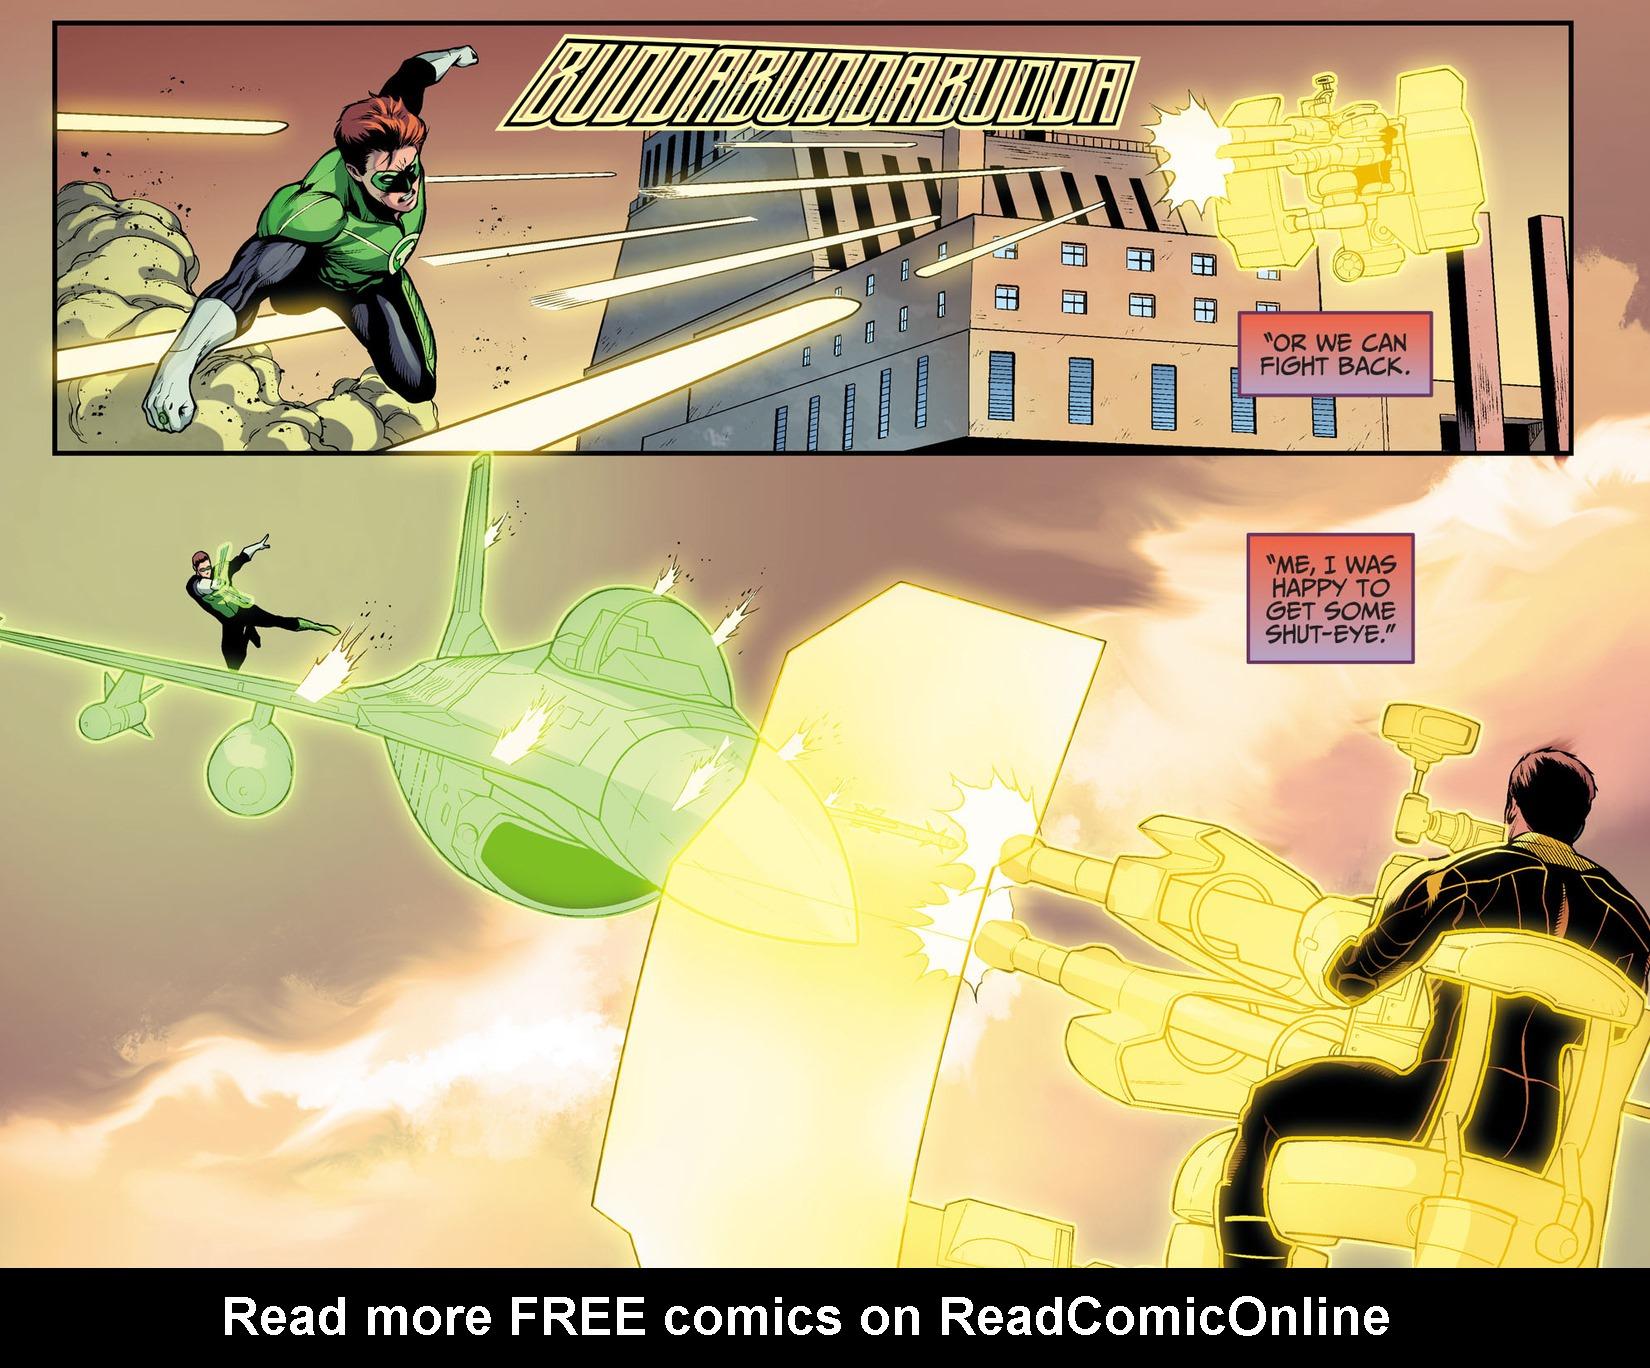 Read online Injustice: Ground Zero comic -  Issue #17 - 18